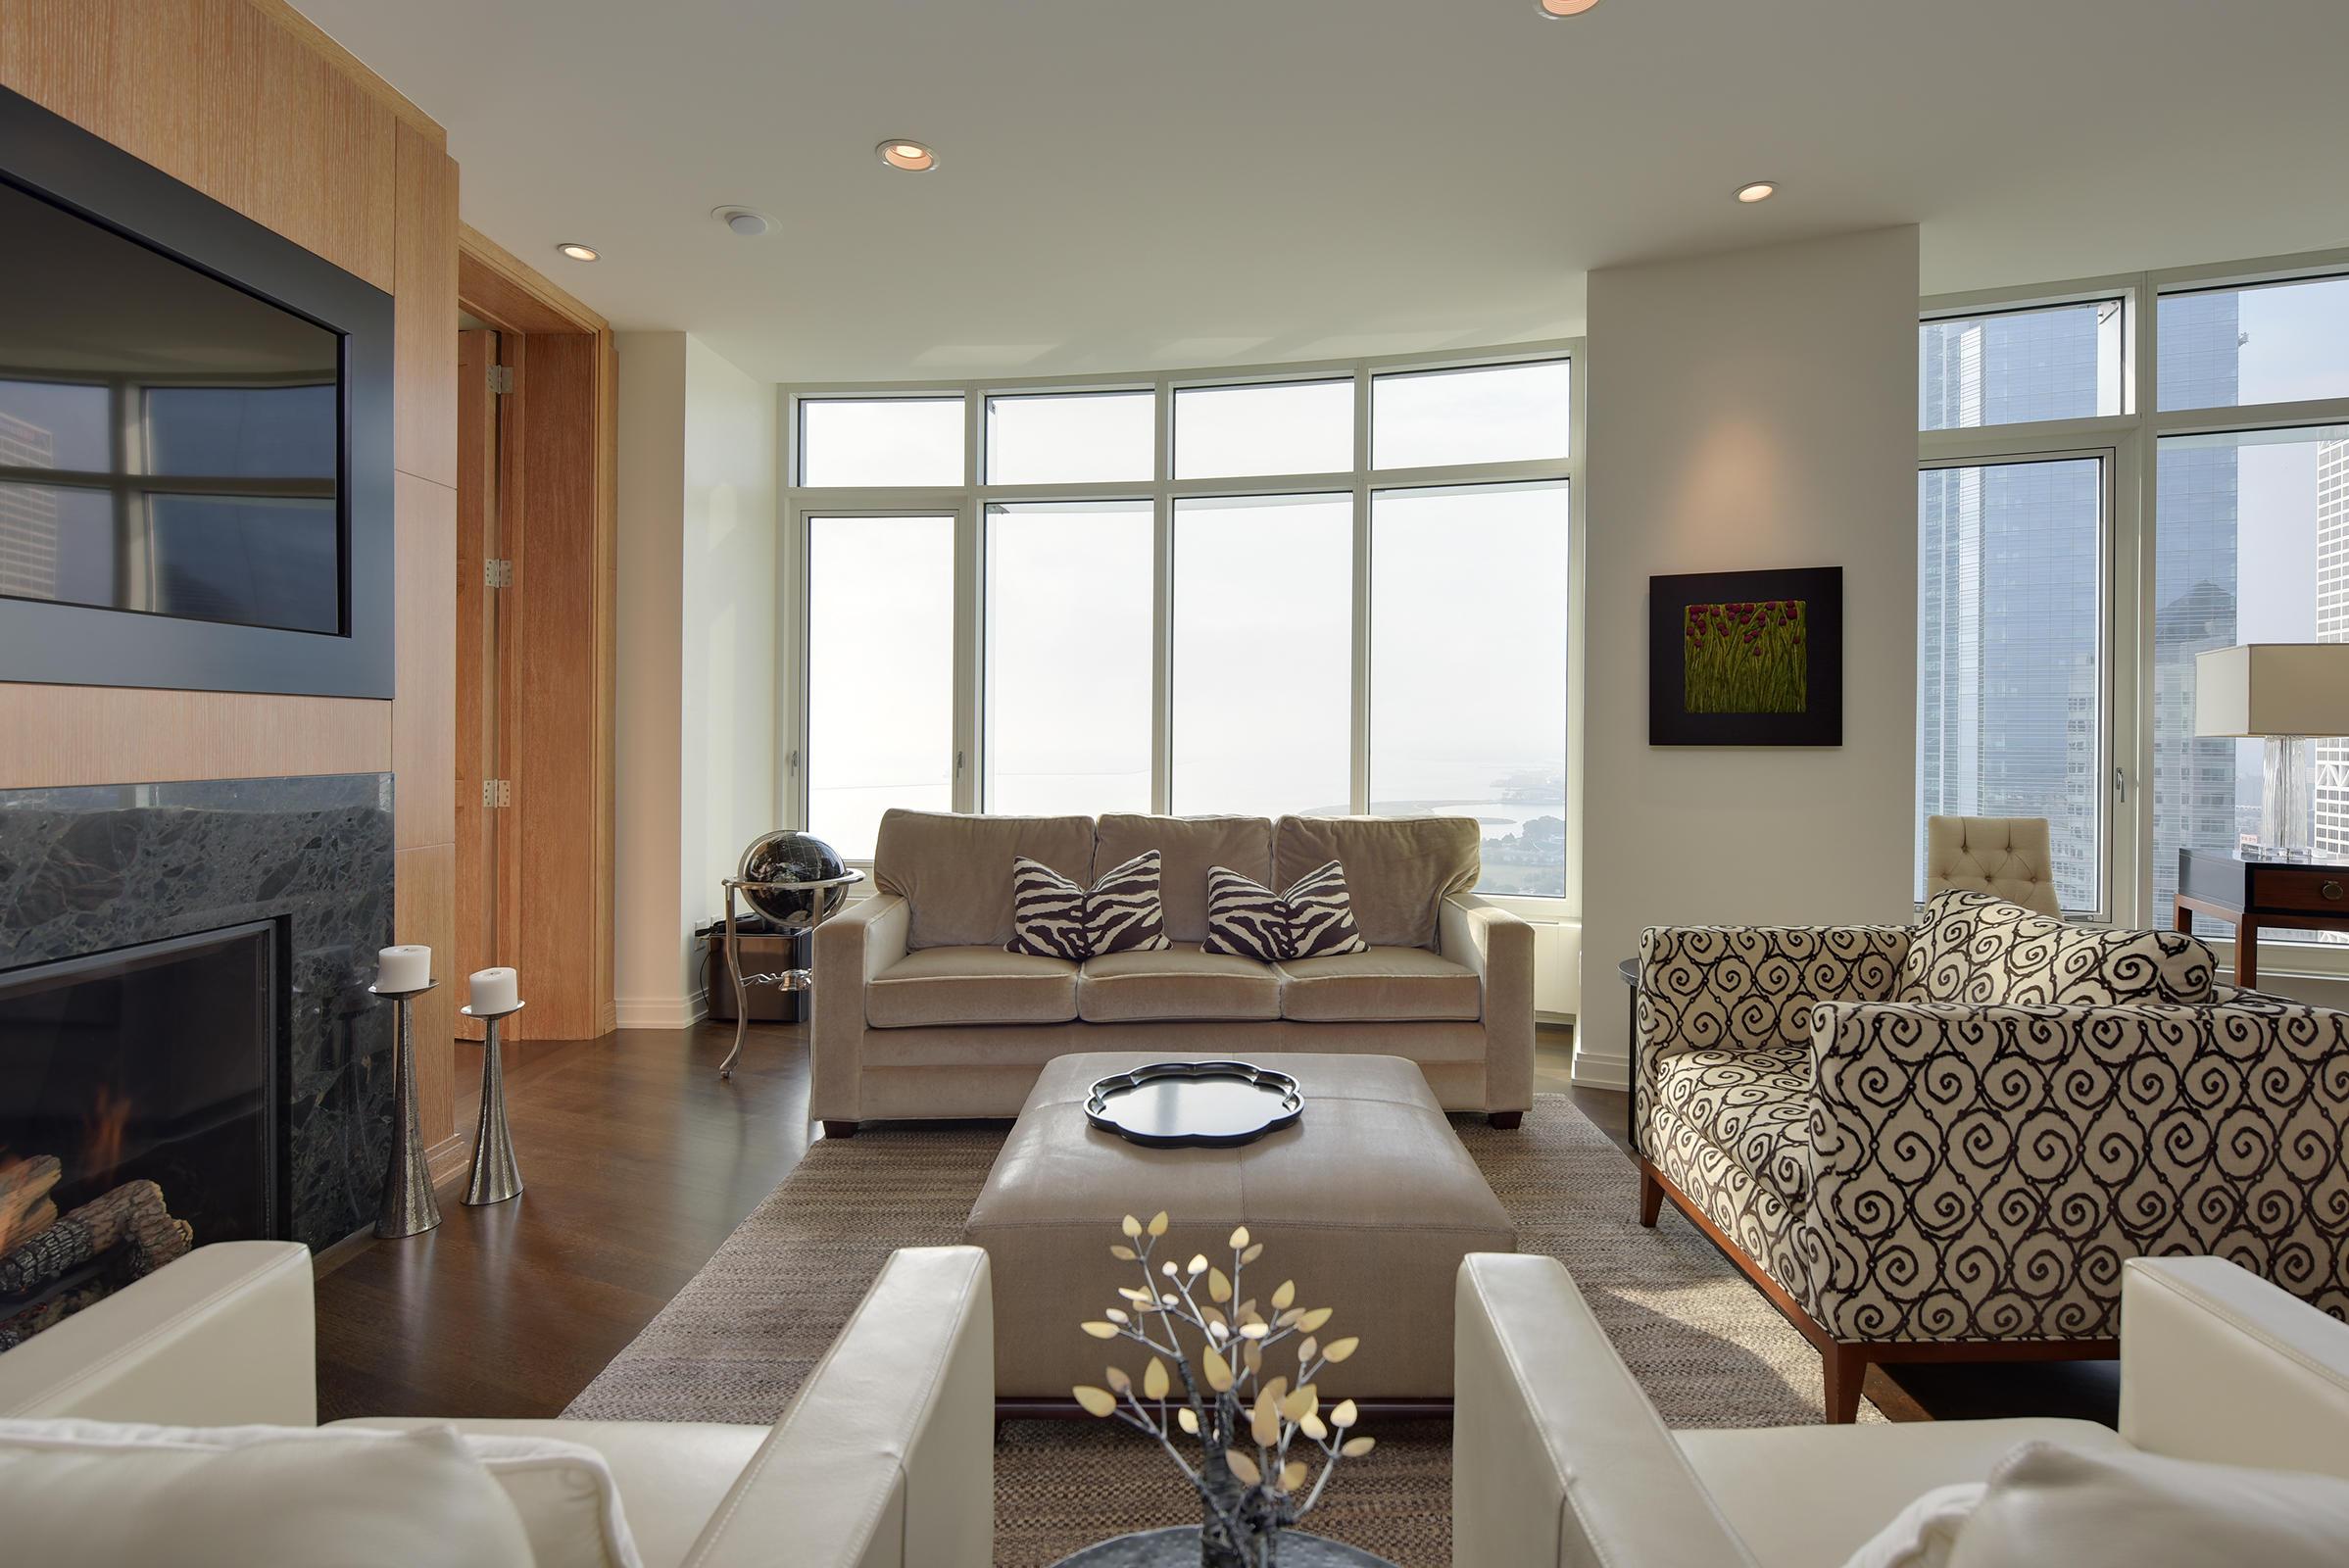 825 Prospect Ave, Milwaukee, Wisconsin 53202, 2 Bedrooms Bedrooms, 6 Rooms Rooms,2 BathroomsBathrooms,Condominiums,For Sale,Prospect Ave,21,1552833